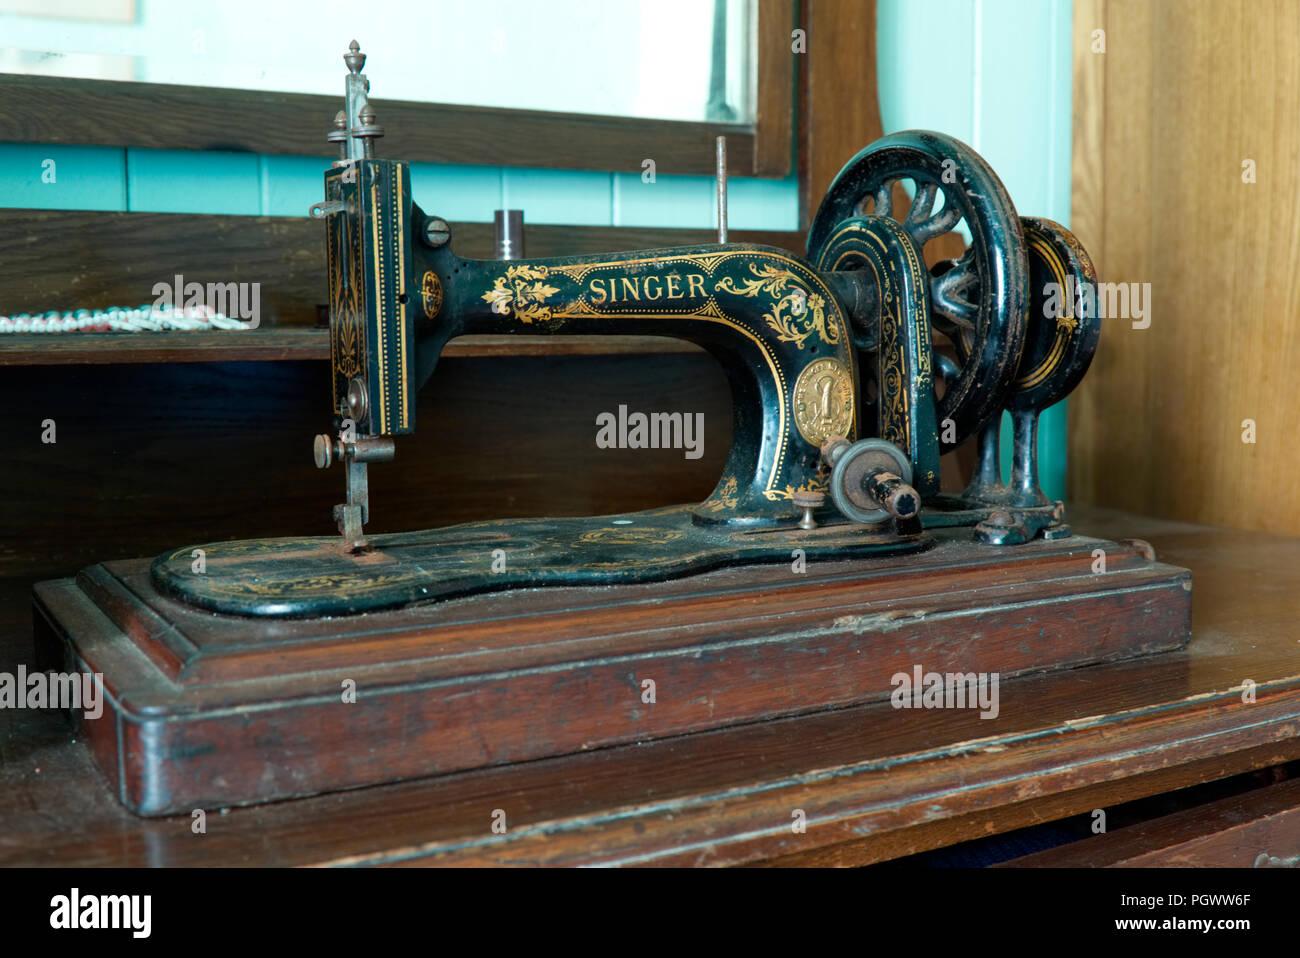 Vintage Singer Sewing Machine Stock Photos & Vintage Singer